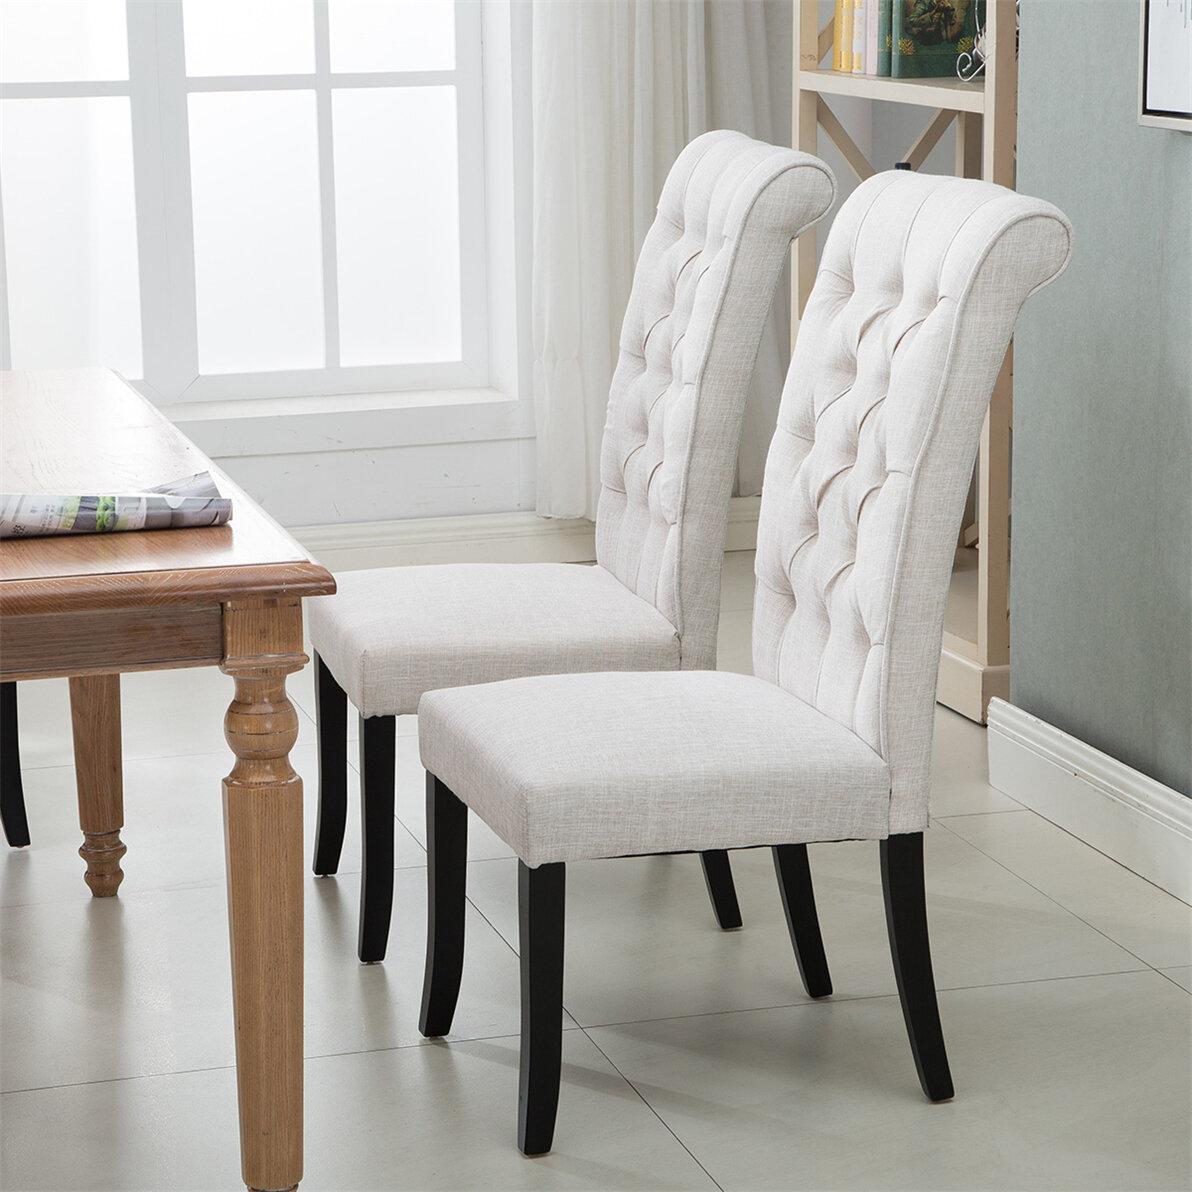 Gracie Oaks Rillie Tufted Upholstered Diningchair Wayfair